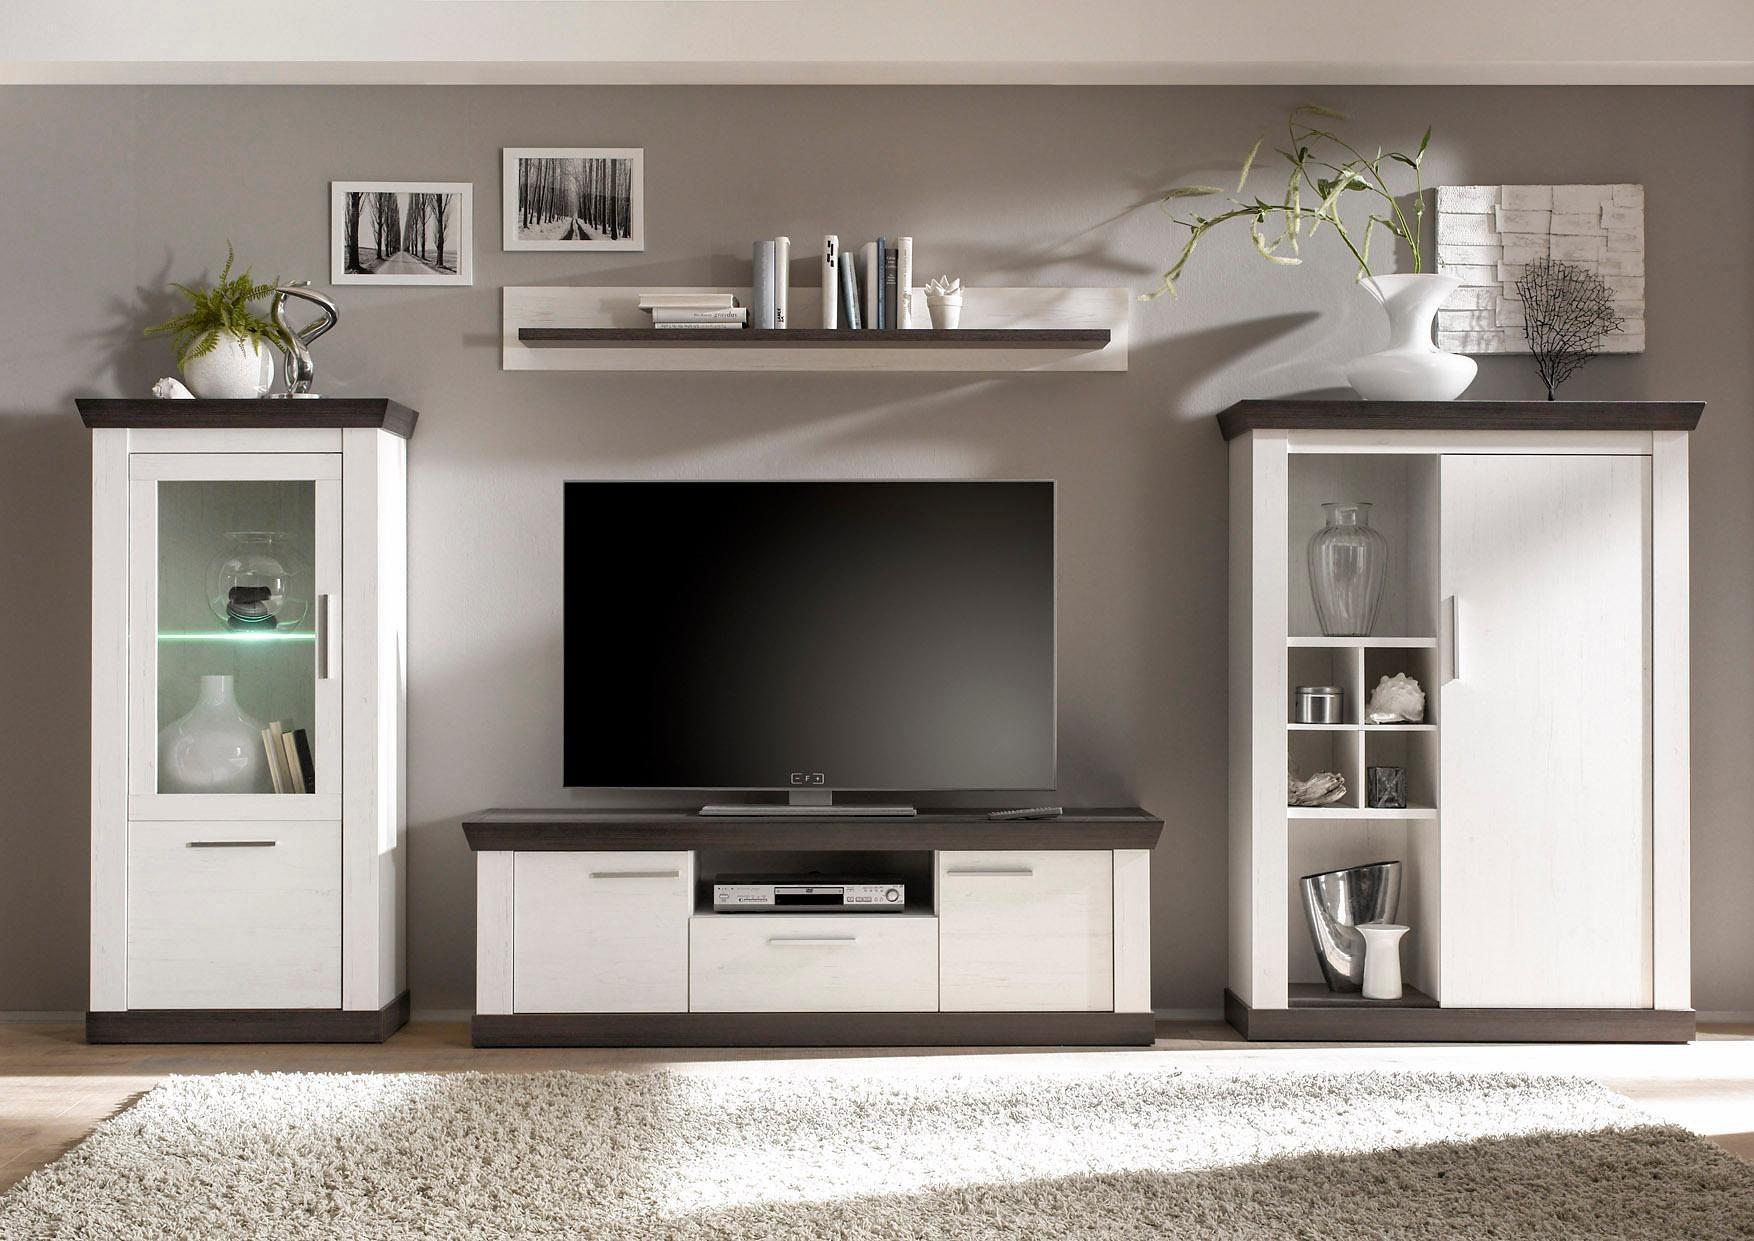 Home affaire Wohnwand »Siena«, Set, 4 tlg kaufen   OTTO